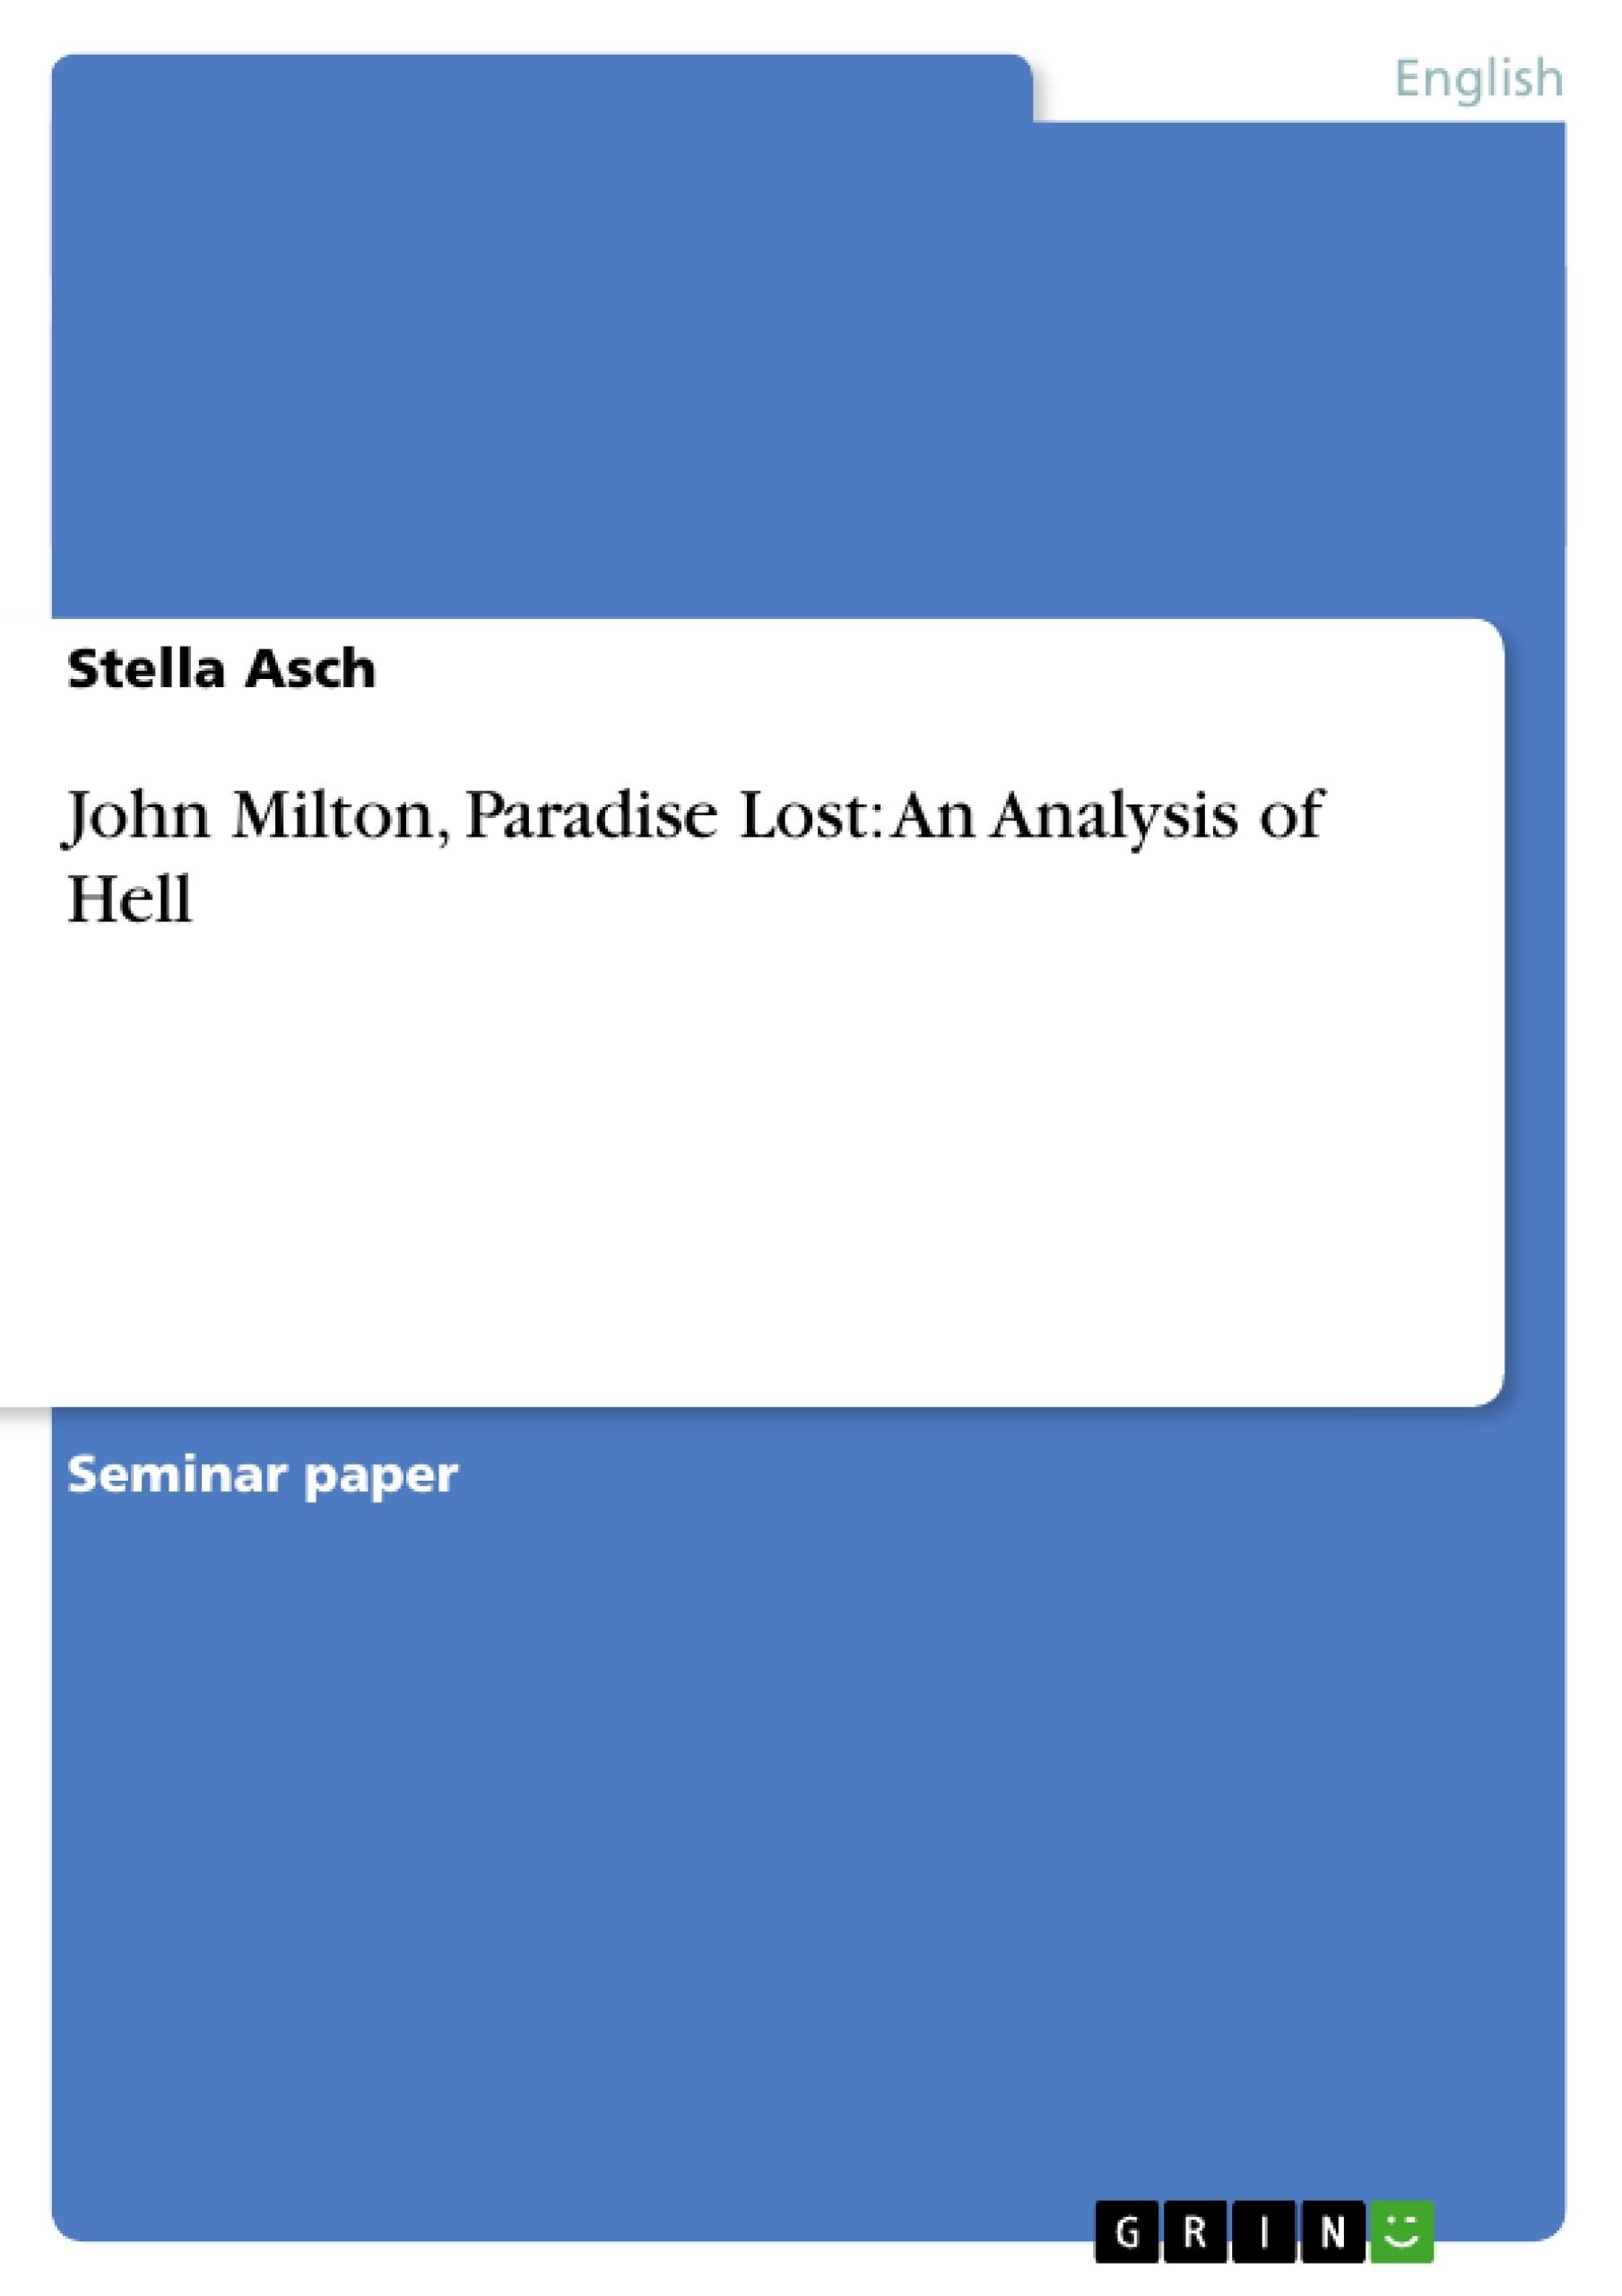 Title: John Milton, Paradise Lost: An Analysis of Hell